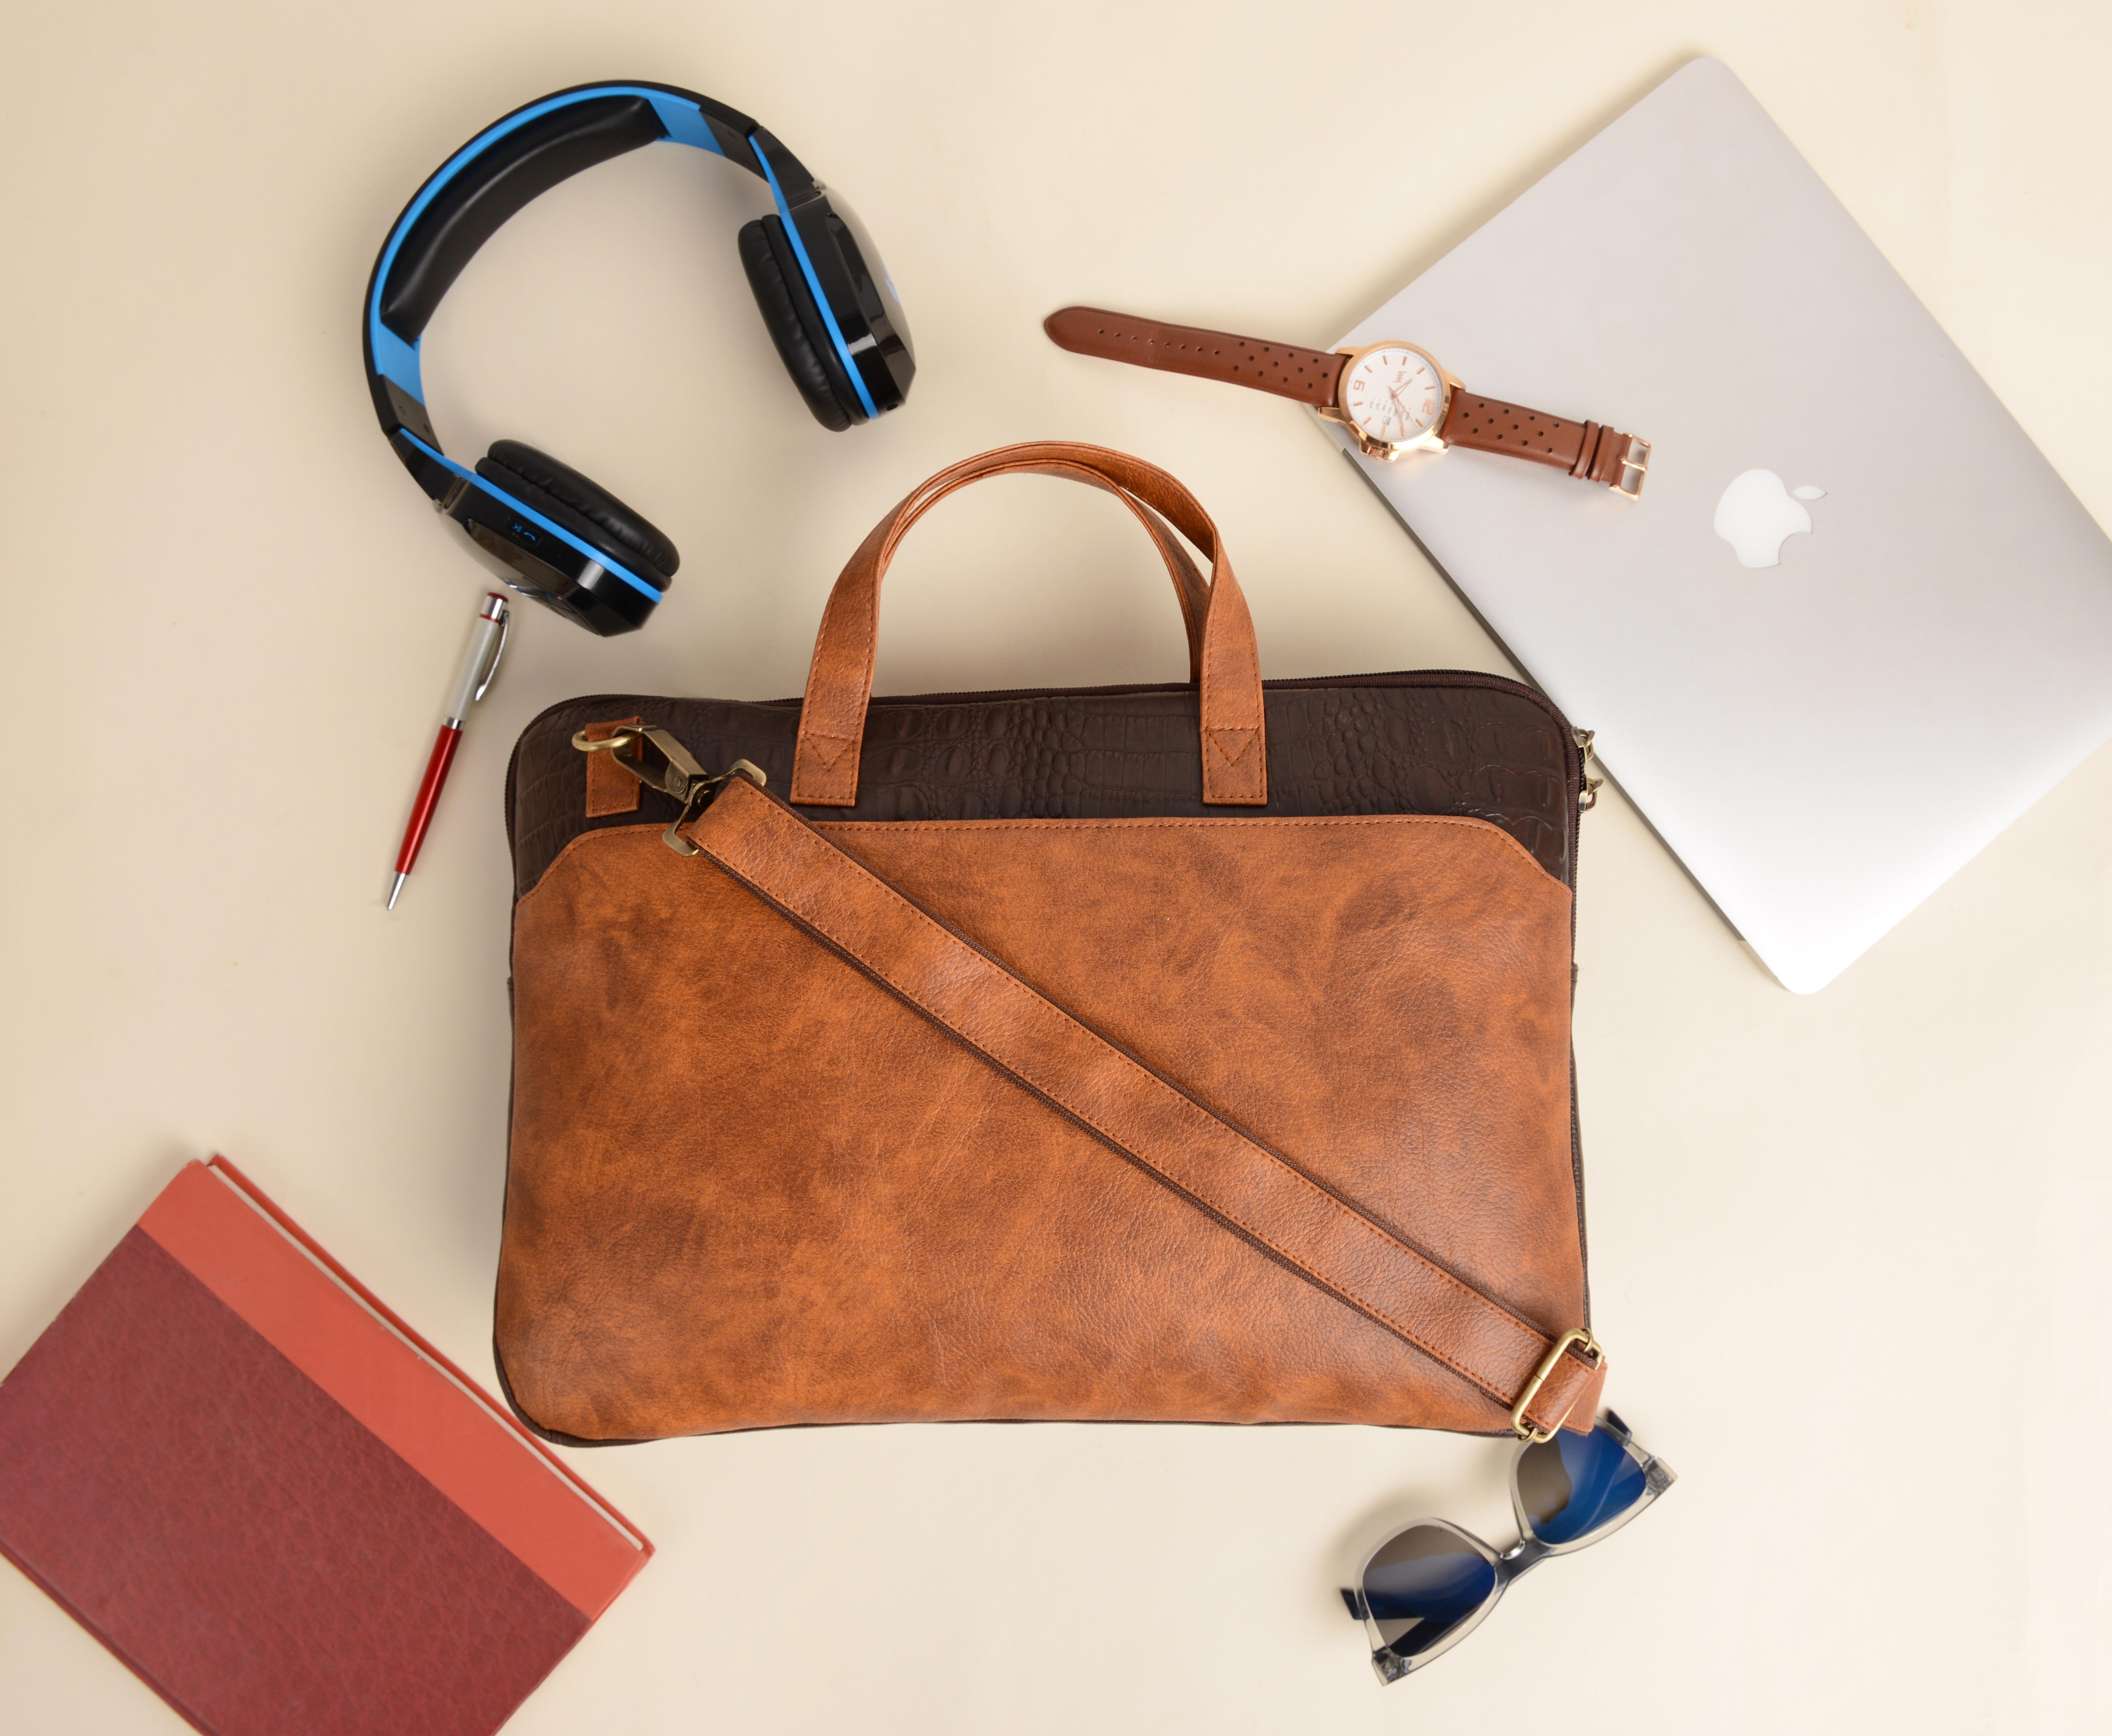 Vivinkaa | Vivinkaa Faux Leather 15.6 inch Tan/Brown Padded Laptop Messenger bag for Men & Women